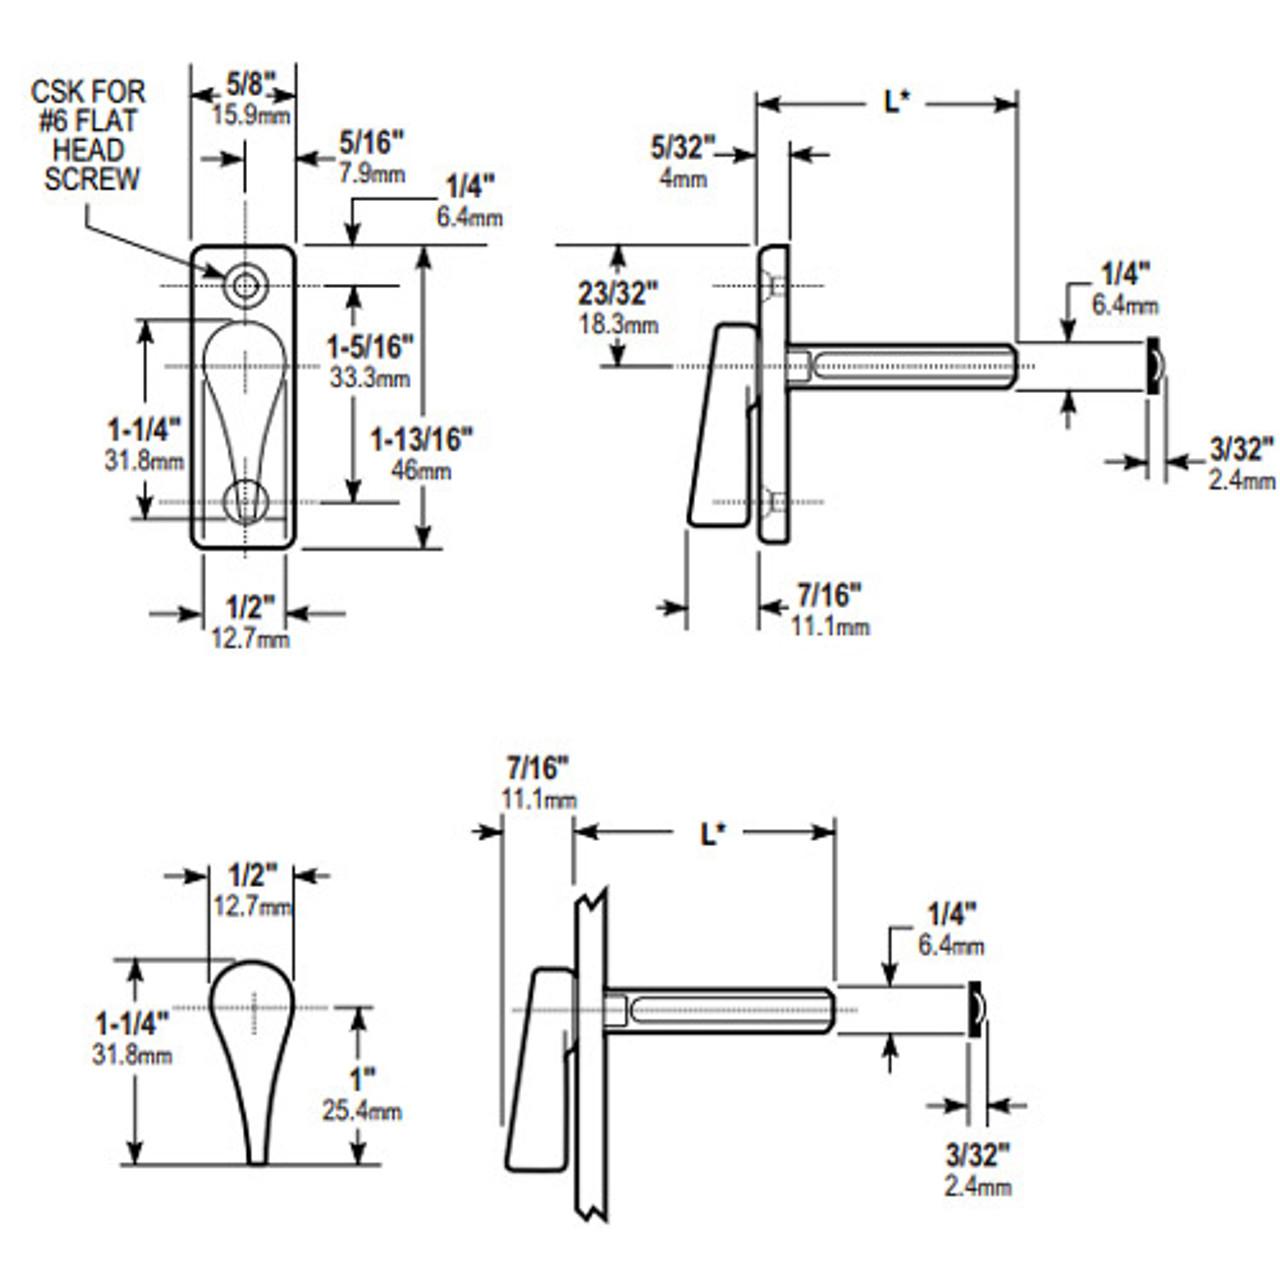 1000-02-26-121 Adams Rite 1000 Series Turns Dimensional View